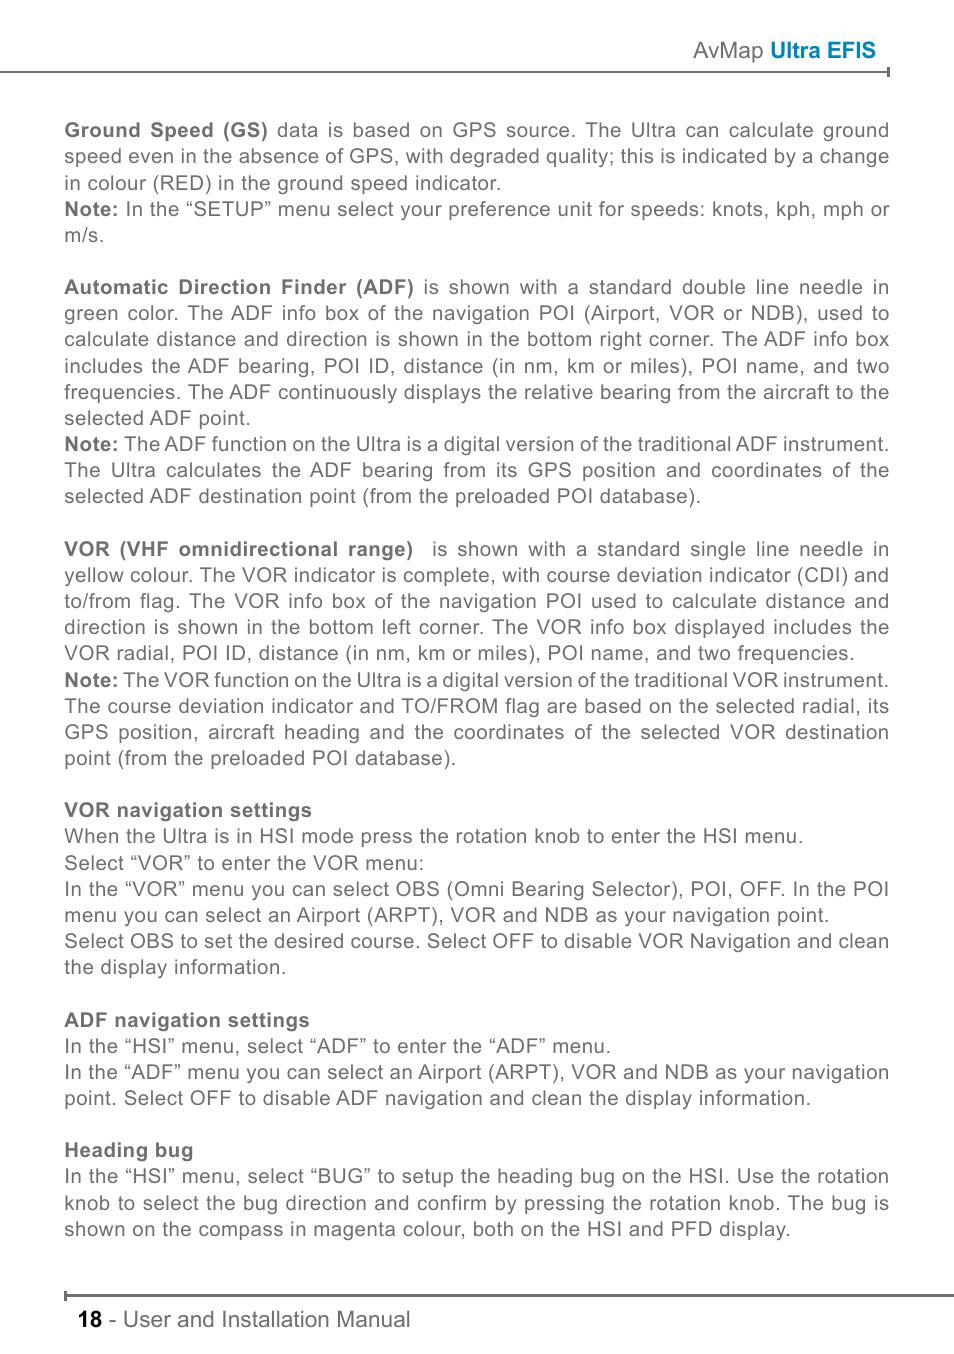 AvMap ULTRA UX0EFS2XAM User Manual   Page 18 / 24